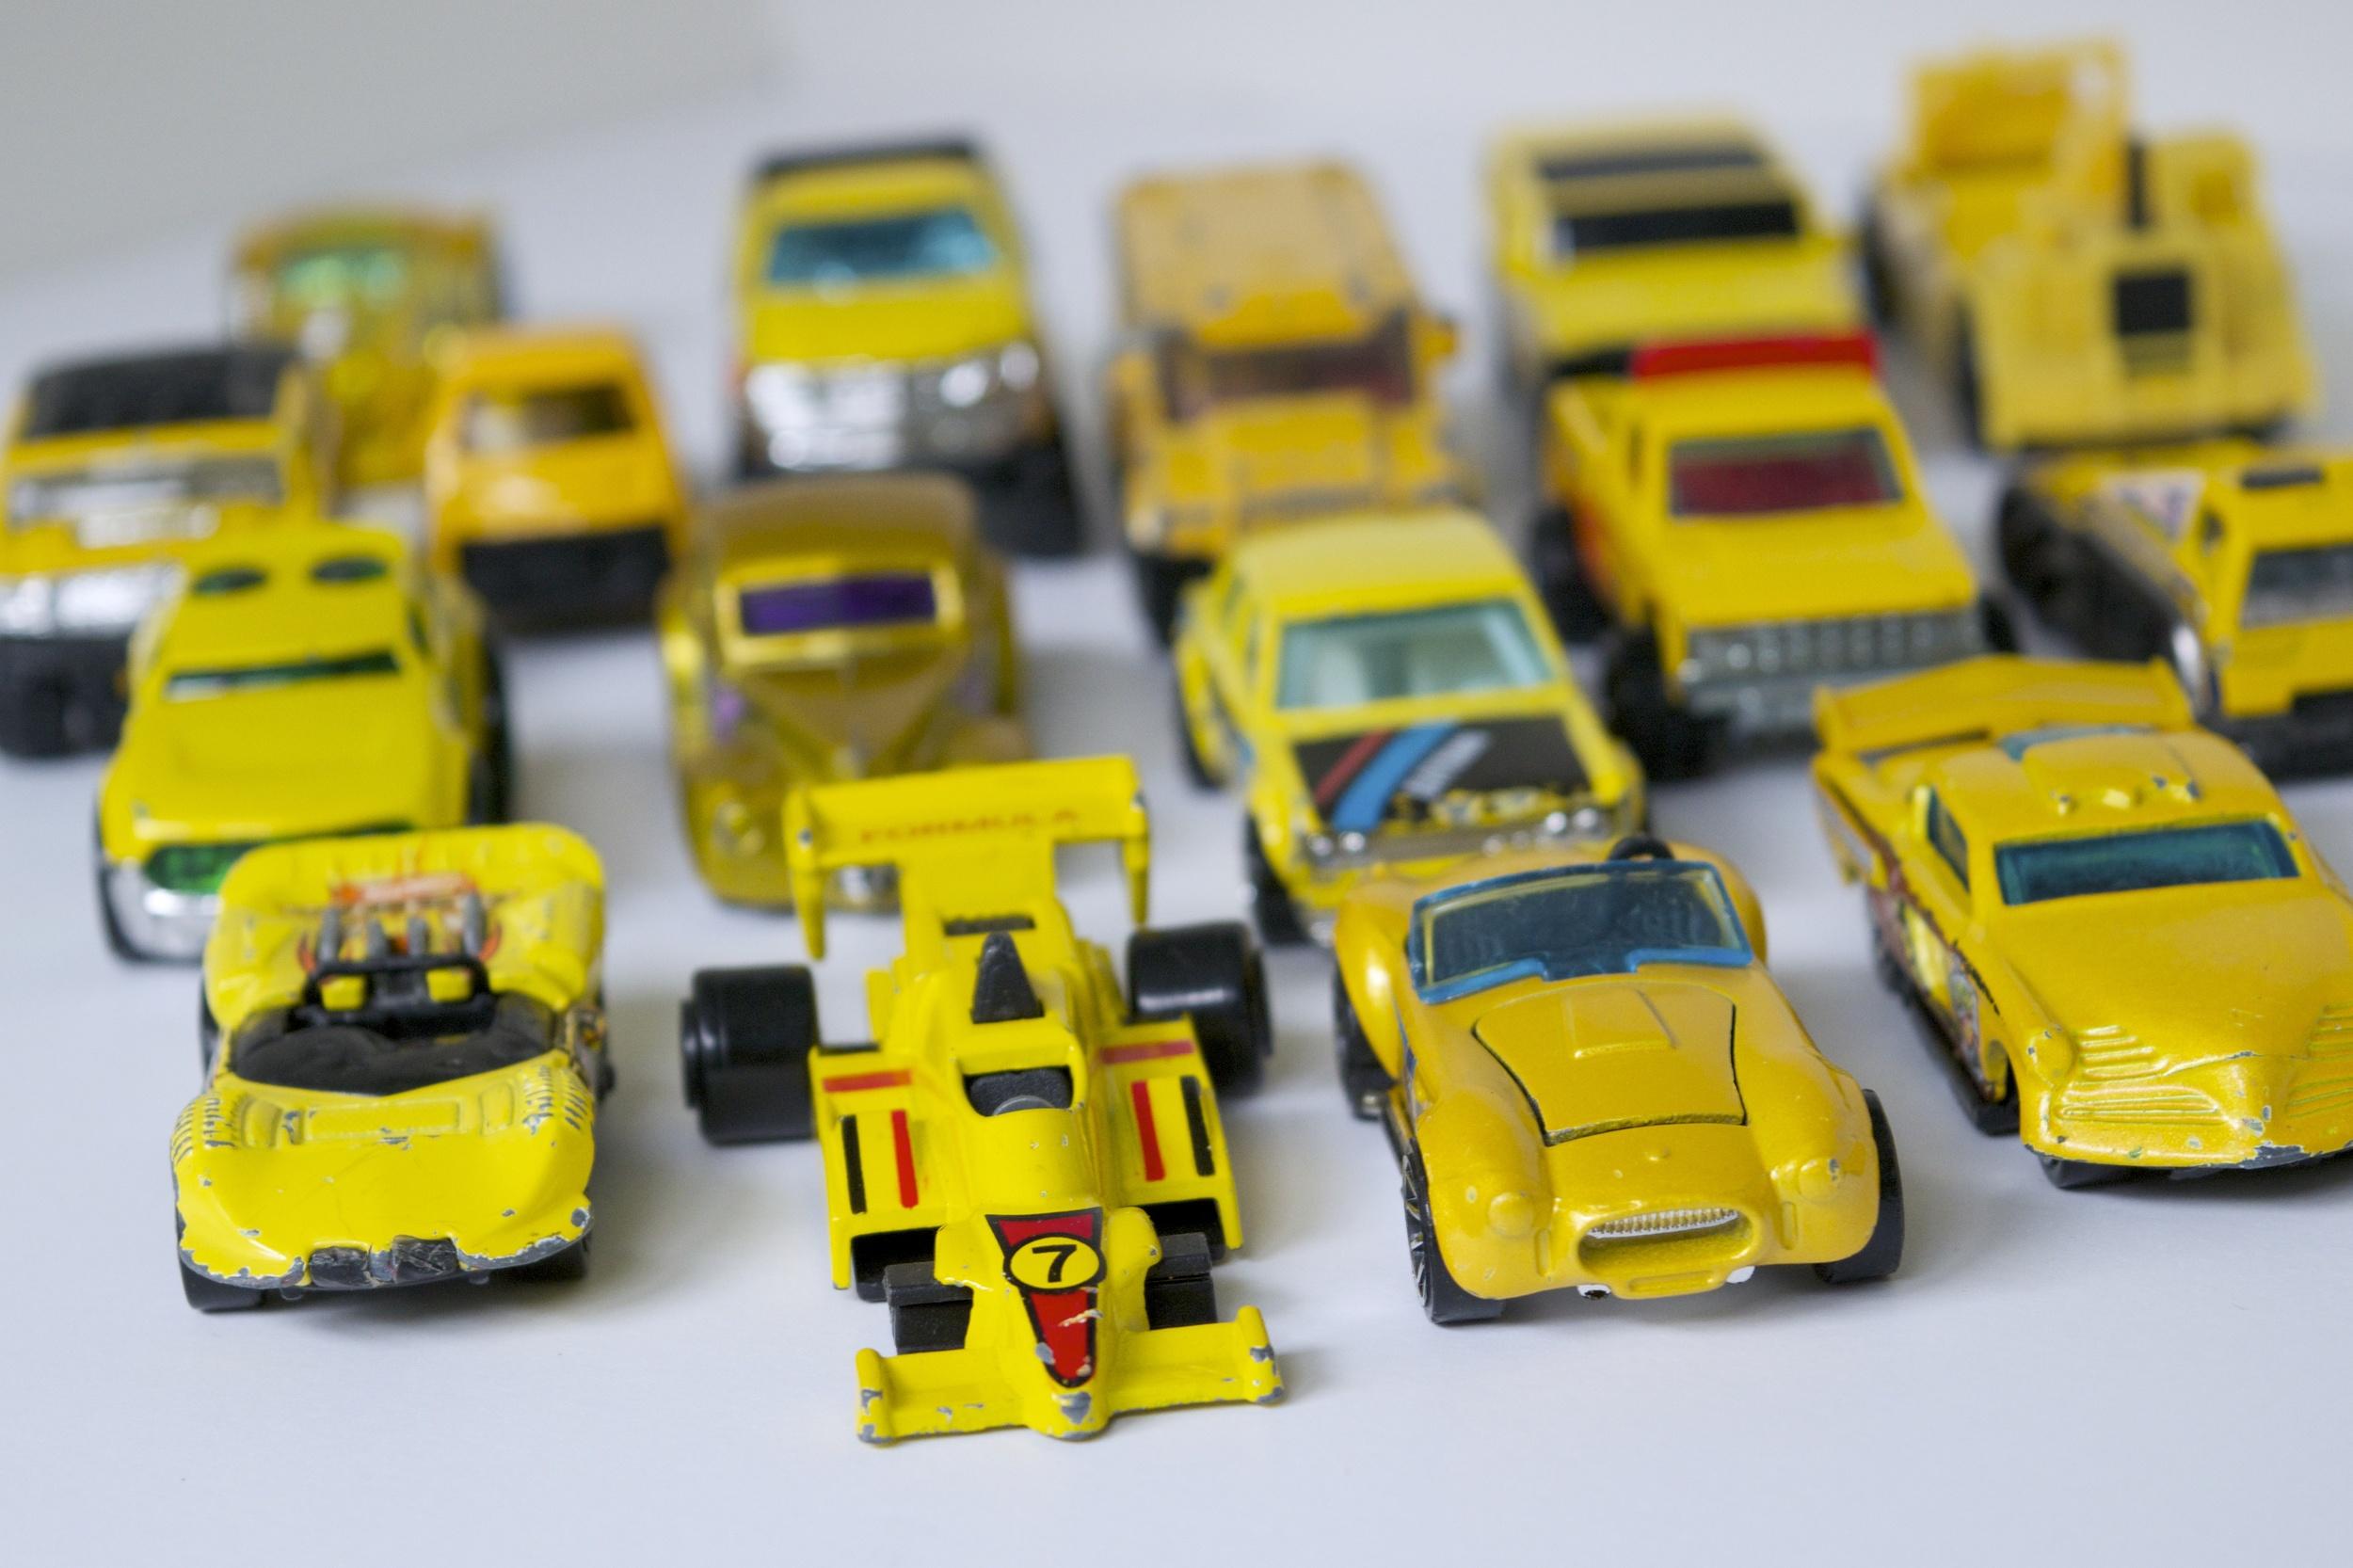 DSC_0126.jpg eleven yellow cars